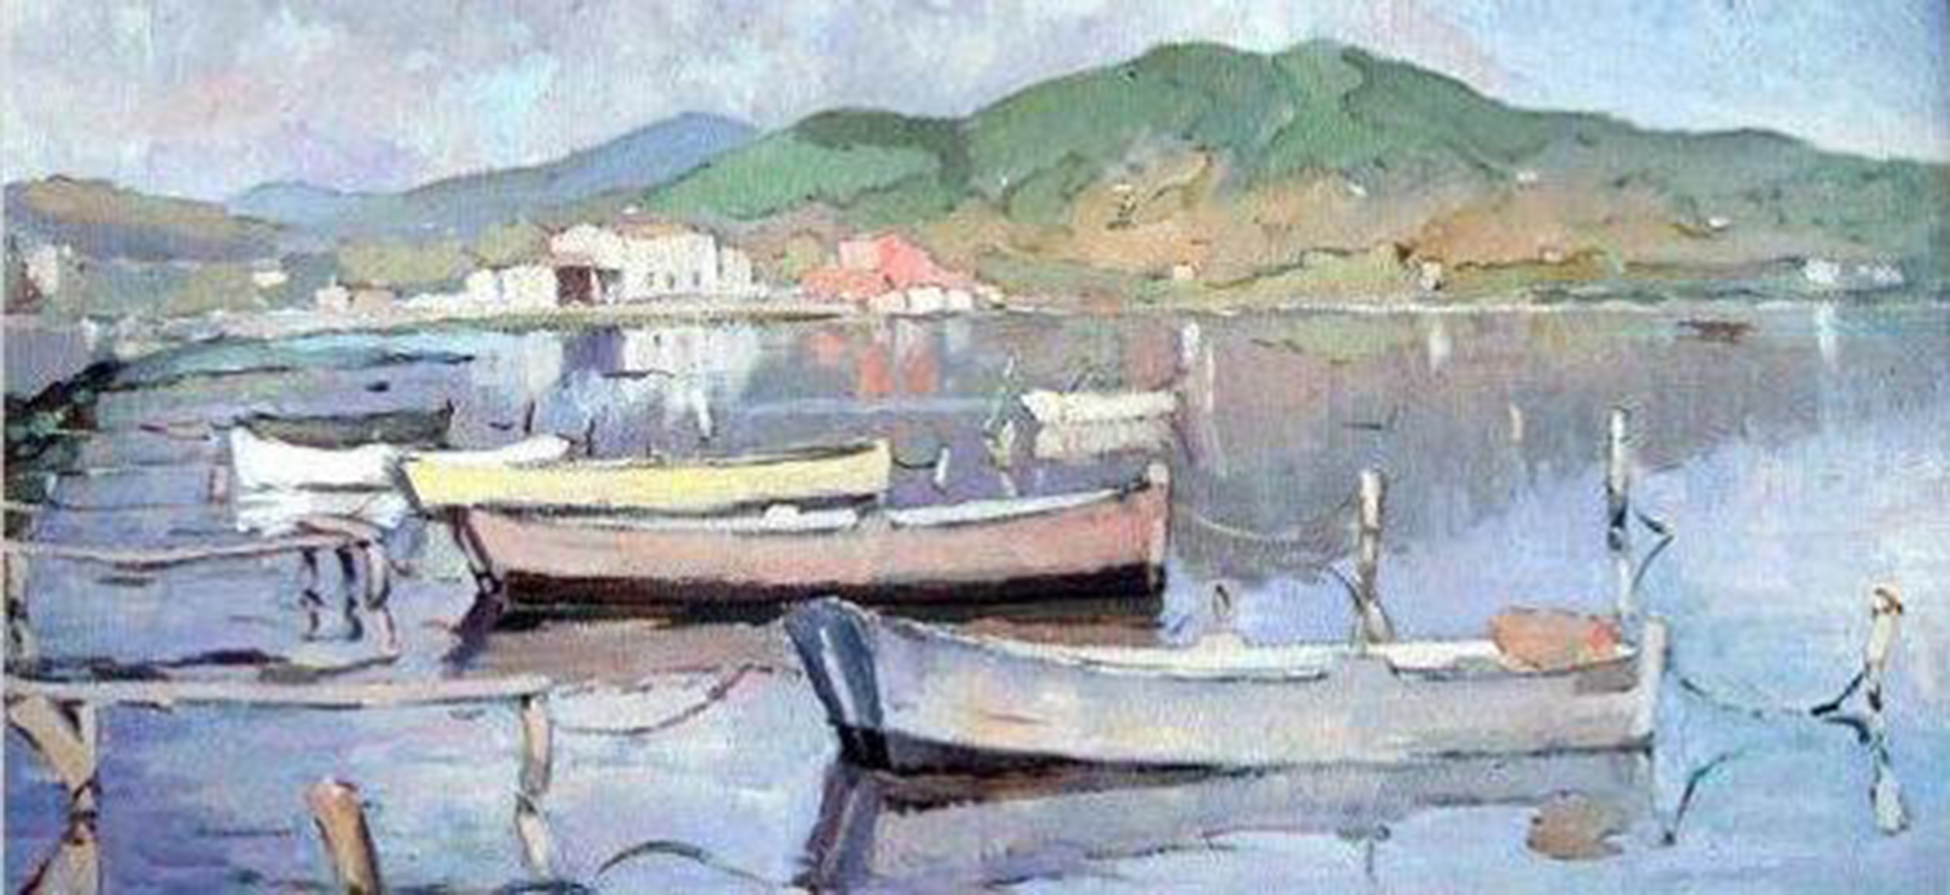 Barques (detall). Antoni Pomar. Eivissa, 1953. Oli sobre tela. Col·lecció Ramon Medina